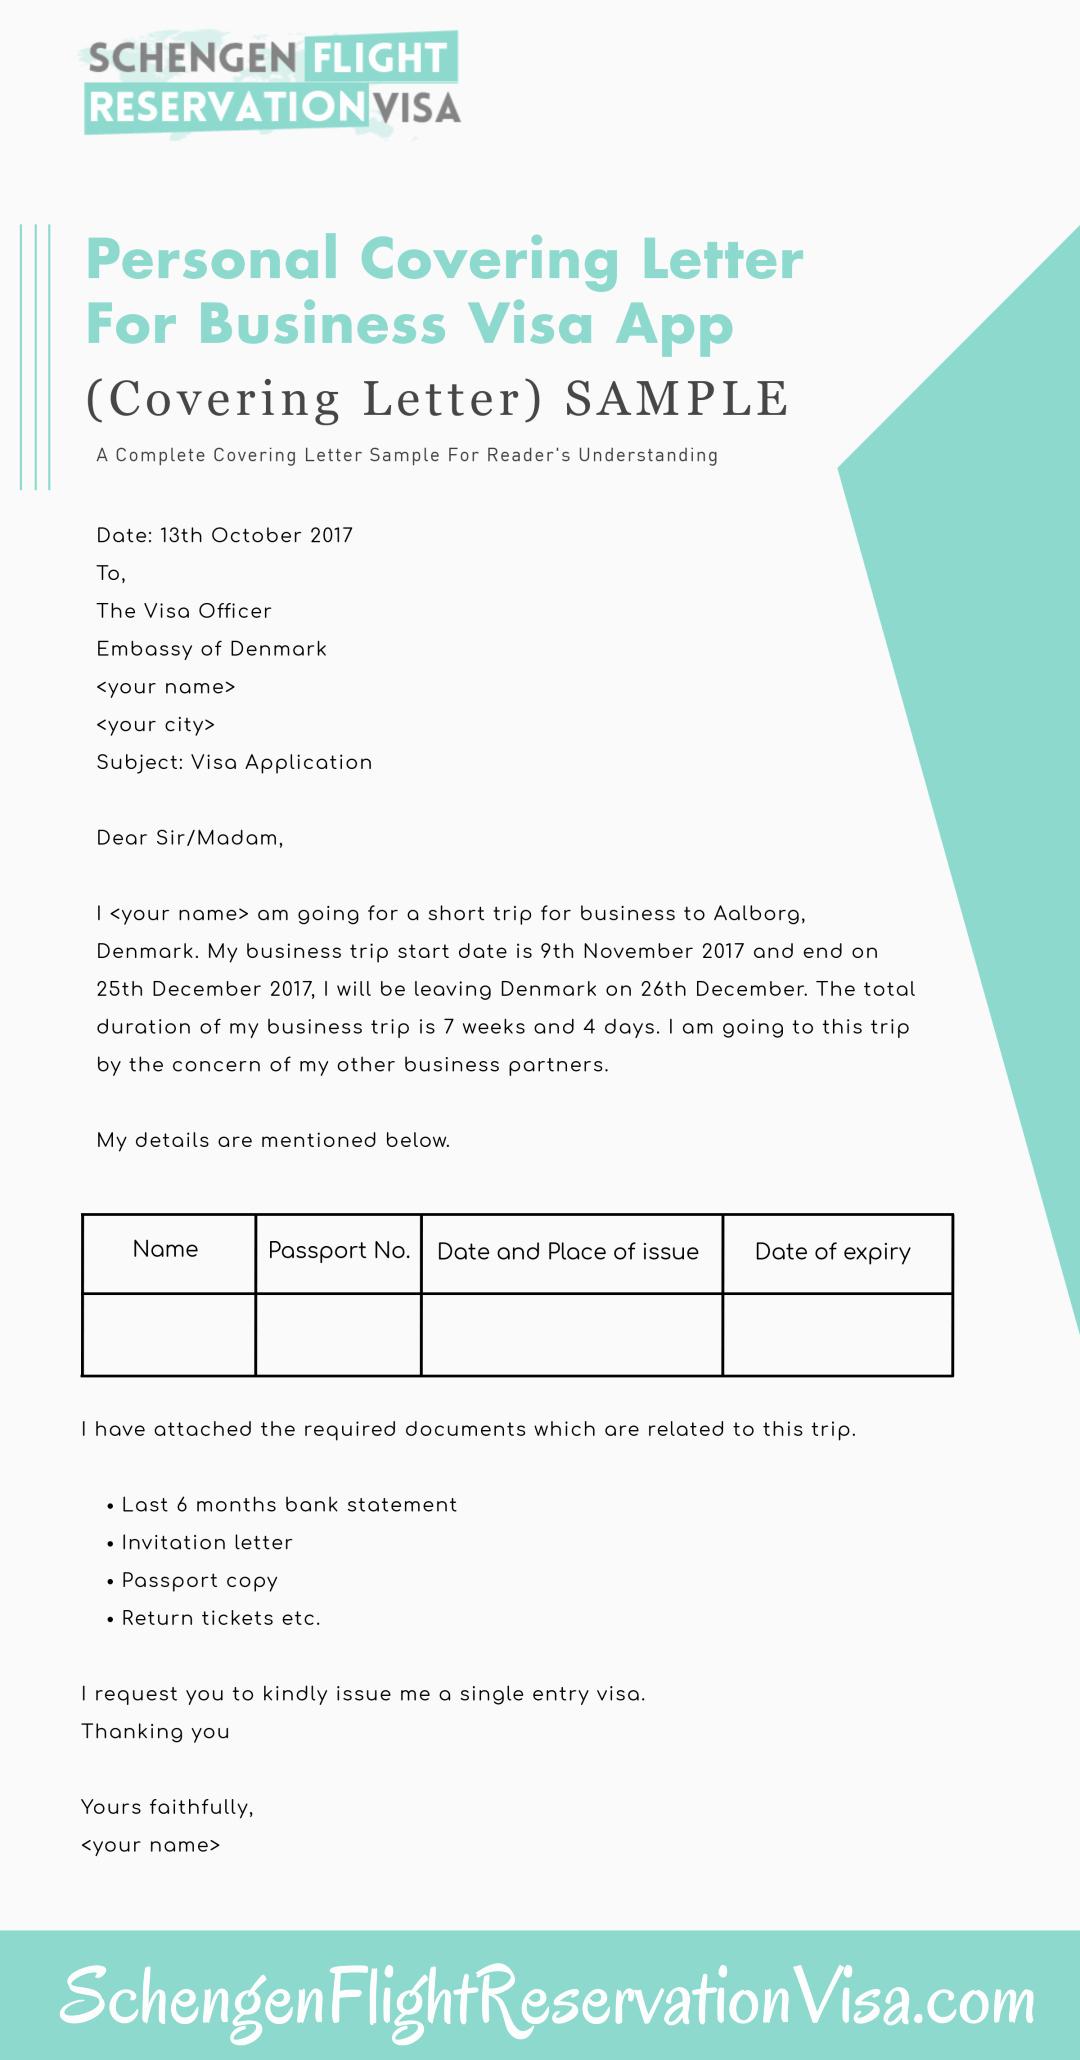 U Visa Personal Statement Sample Elegant Personal Covering Letter Guide and Samples for Visa